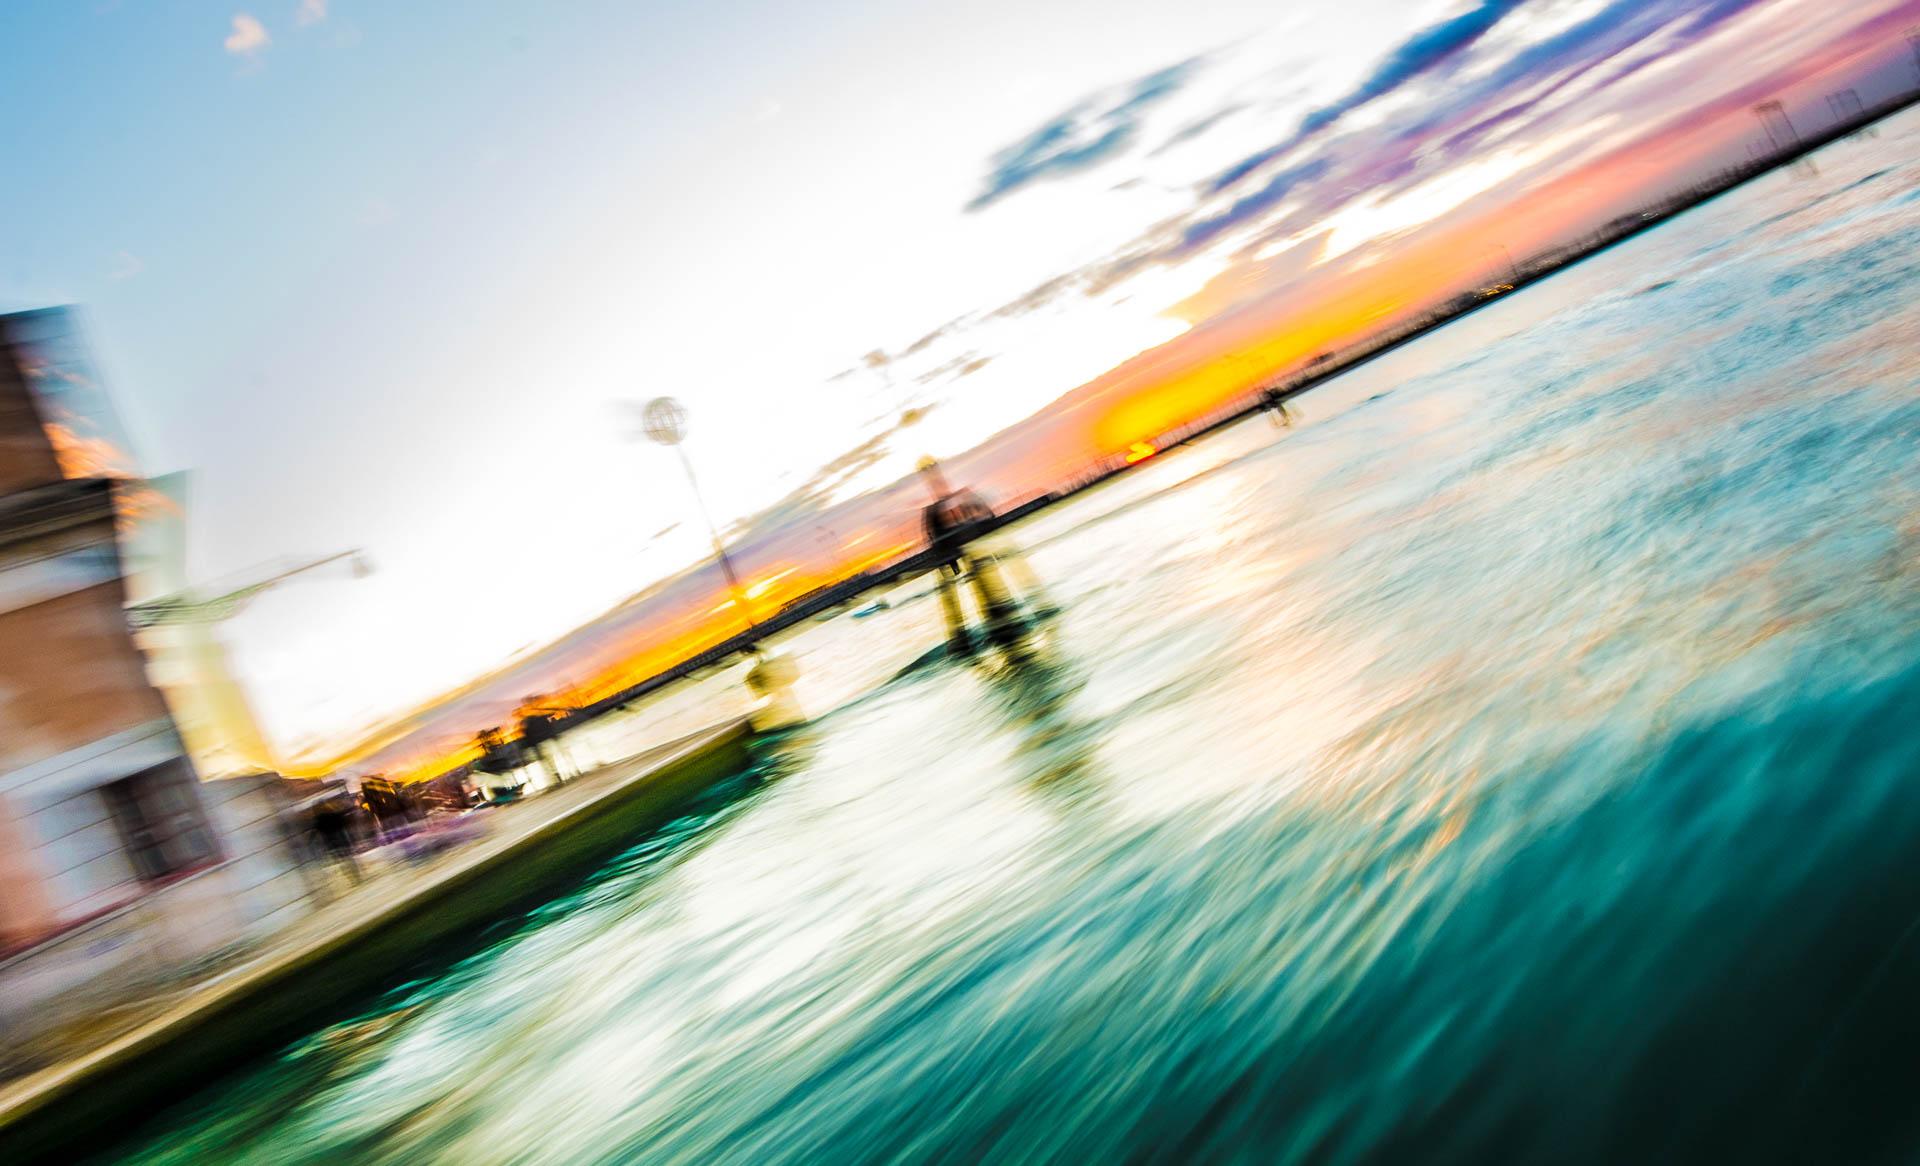 Venice_Movingscape-DSCF5999-20.jpg